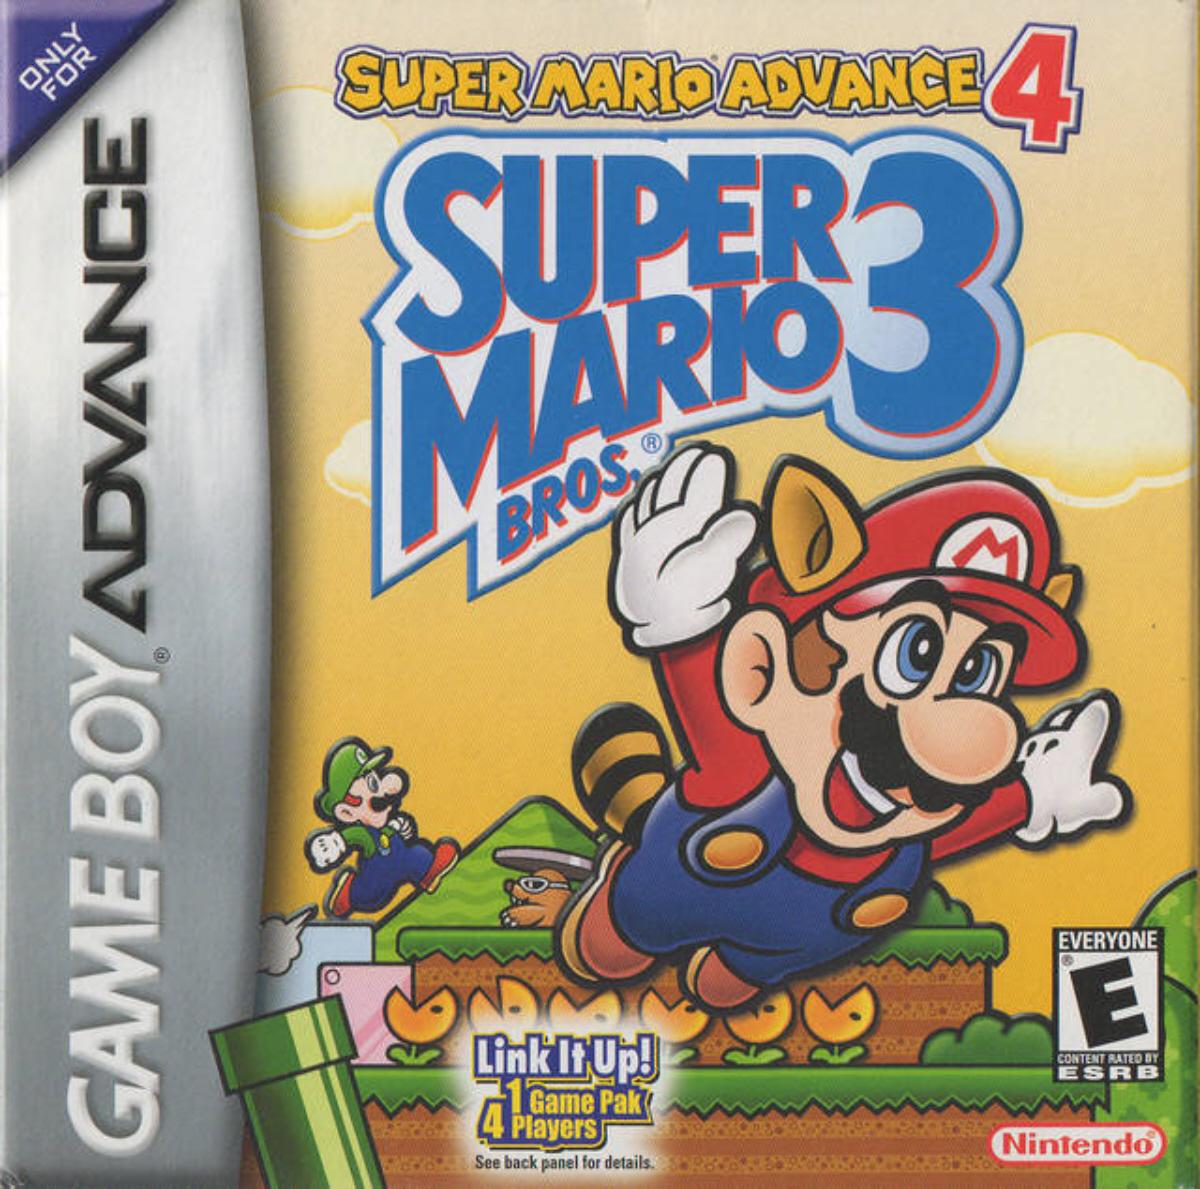 Game boy color super mario bros deluxe - Game Boy Color Super Mario Bros Deluxe 63